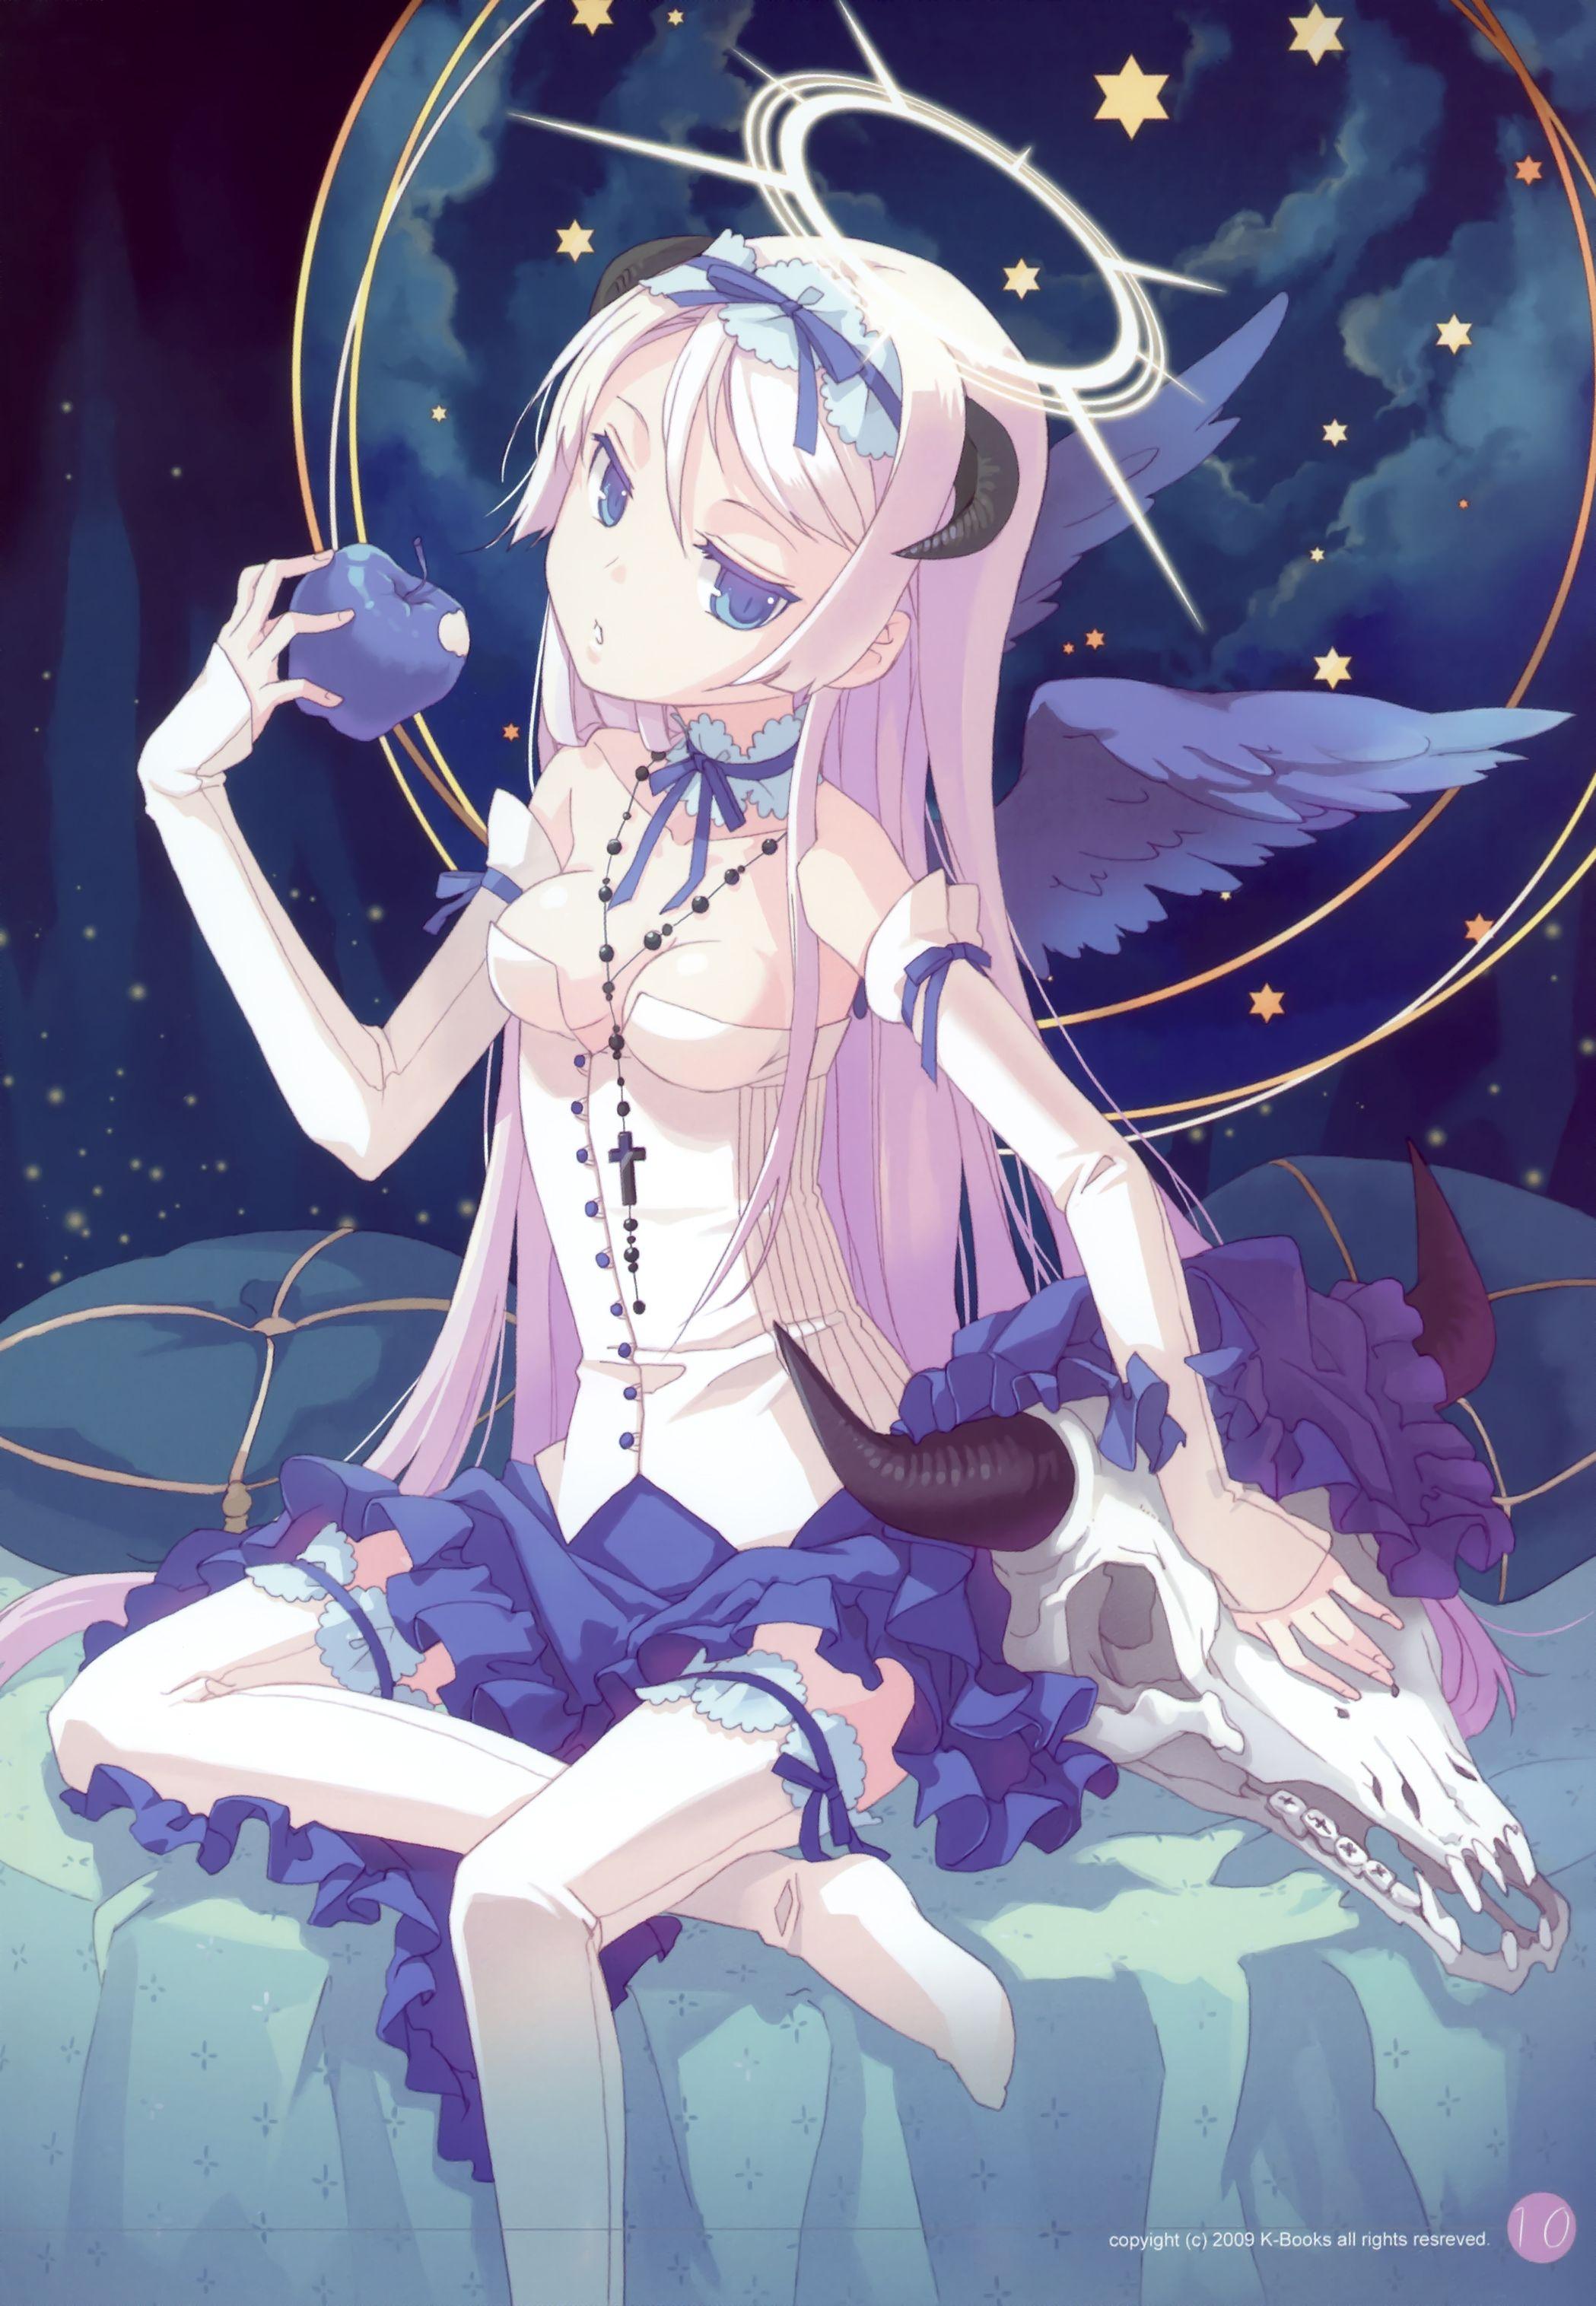 ✮ Anime Art ✮ Angel Angel Wings Horns Halo